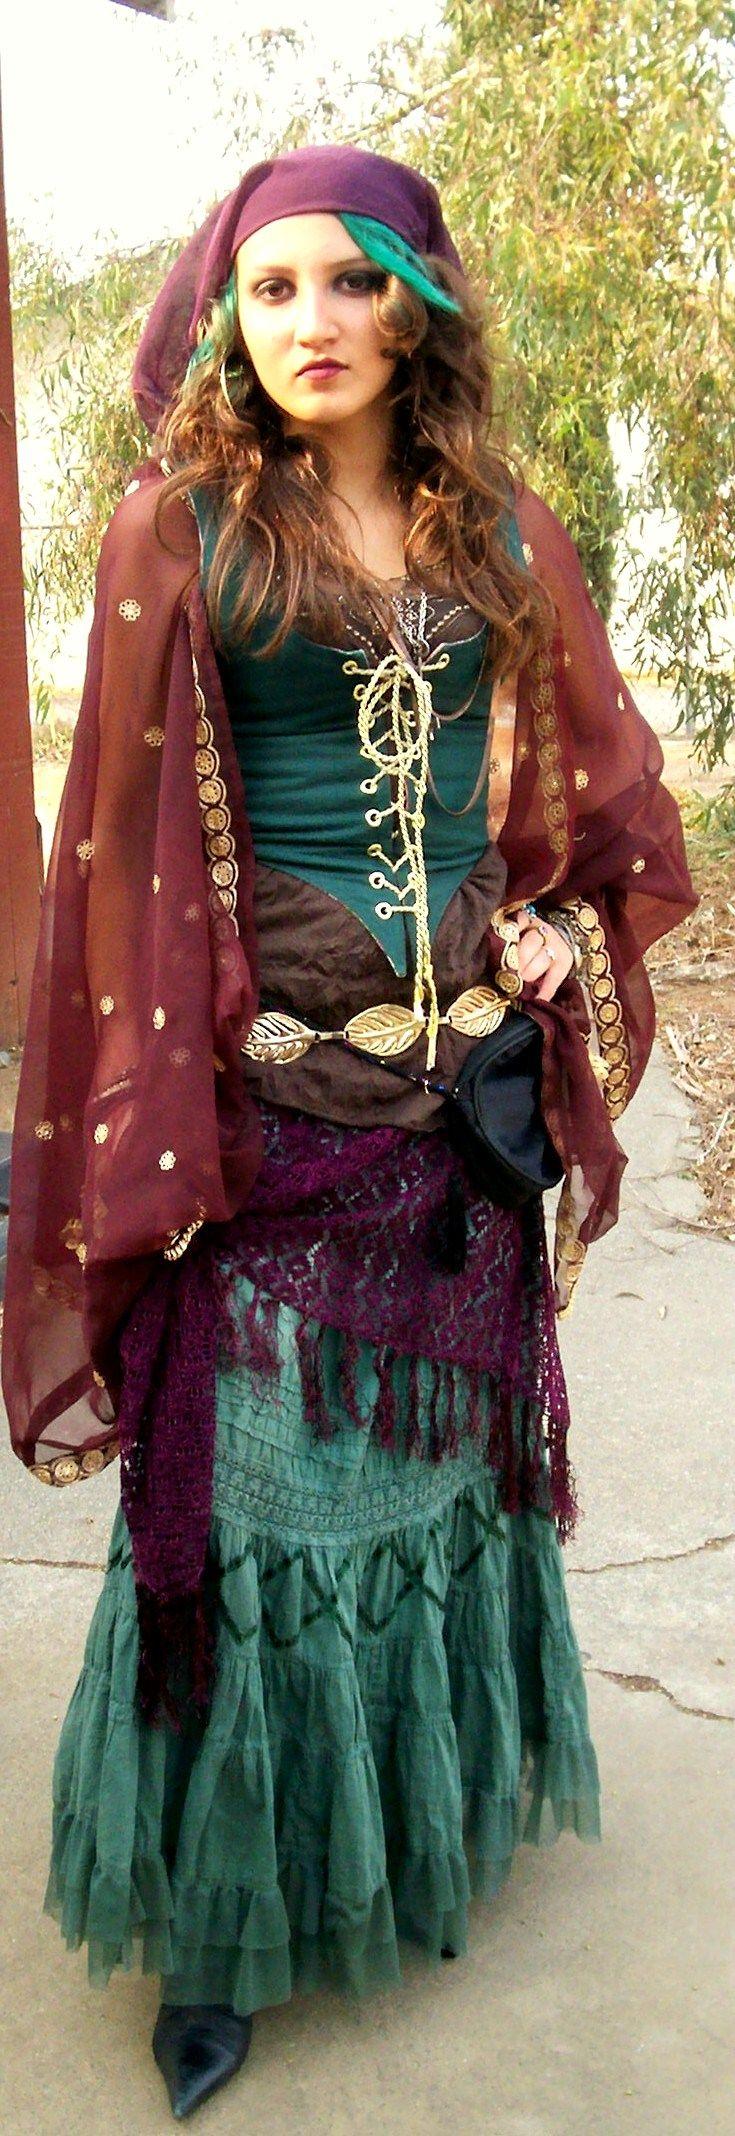 Boho tunic top blouses and dress 4009 trendy boho vintage gypsy - Diy Gypsy Corset Top Skirt Scarf Belt Shawl Purse